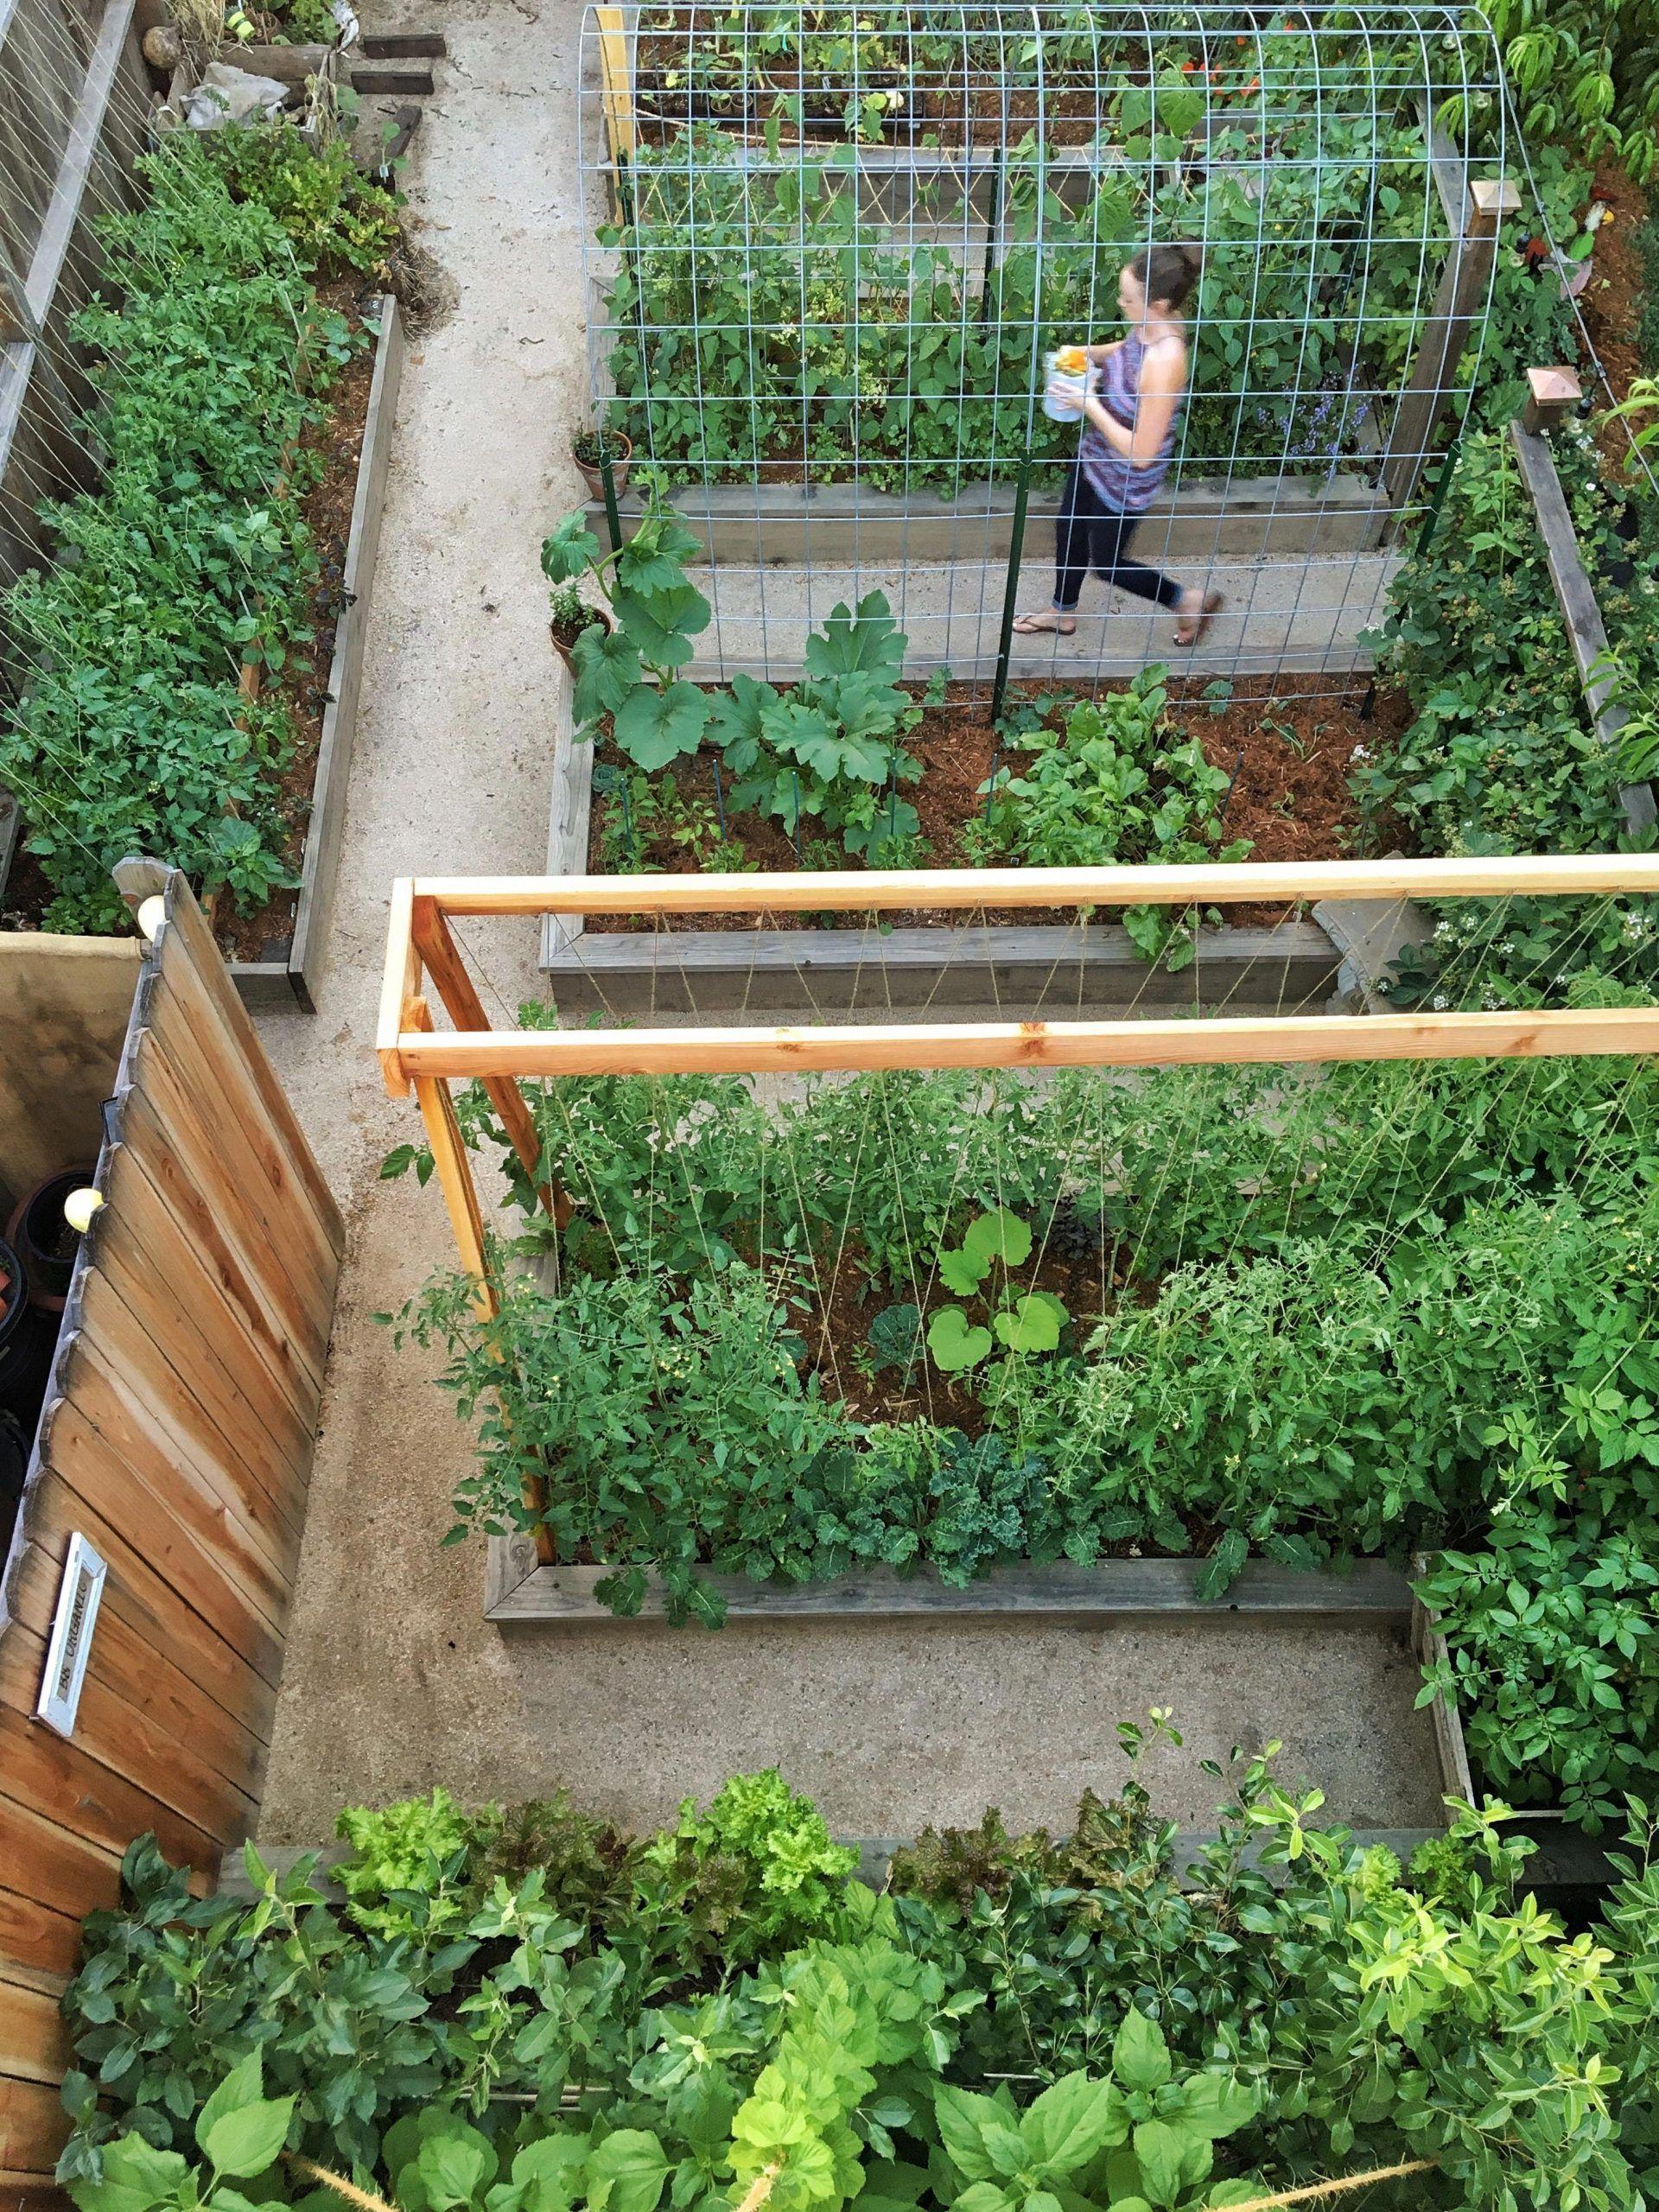 01 Beautiful Small Cottage Garden Ideas For Backyard Inspiration Frontbackhome Wel Vegetable Garden Design Backyard Vegetable Gardens Growing Vegetables Urban backyard farming ideas